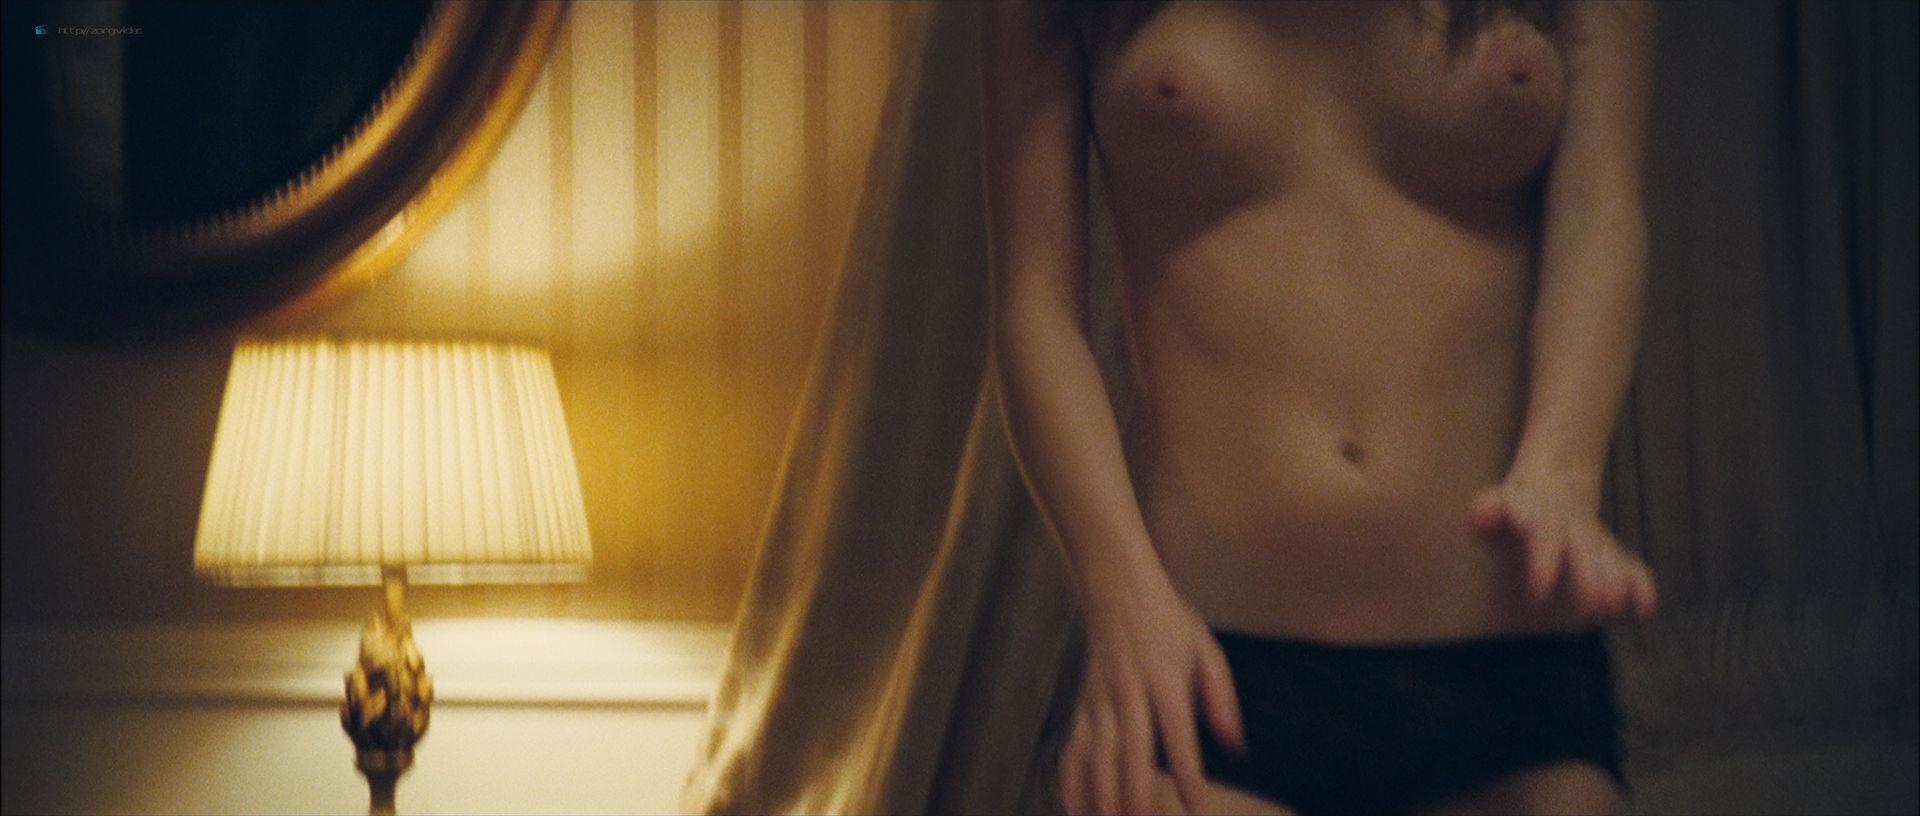 Camille Rowe nude and Josephine de La Baume nude sex threesome - Notre jour viendra (FR-2010) HD 1080p BluRay (15)